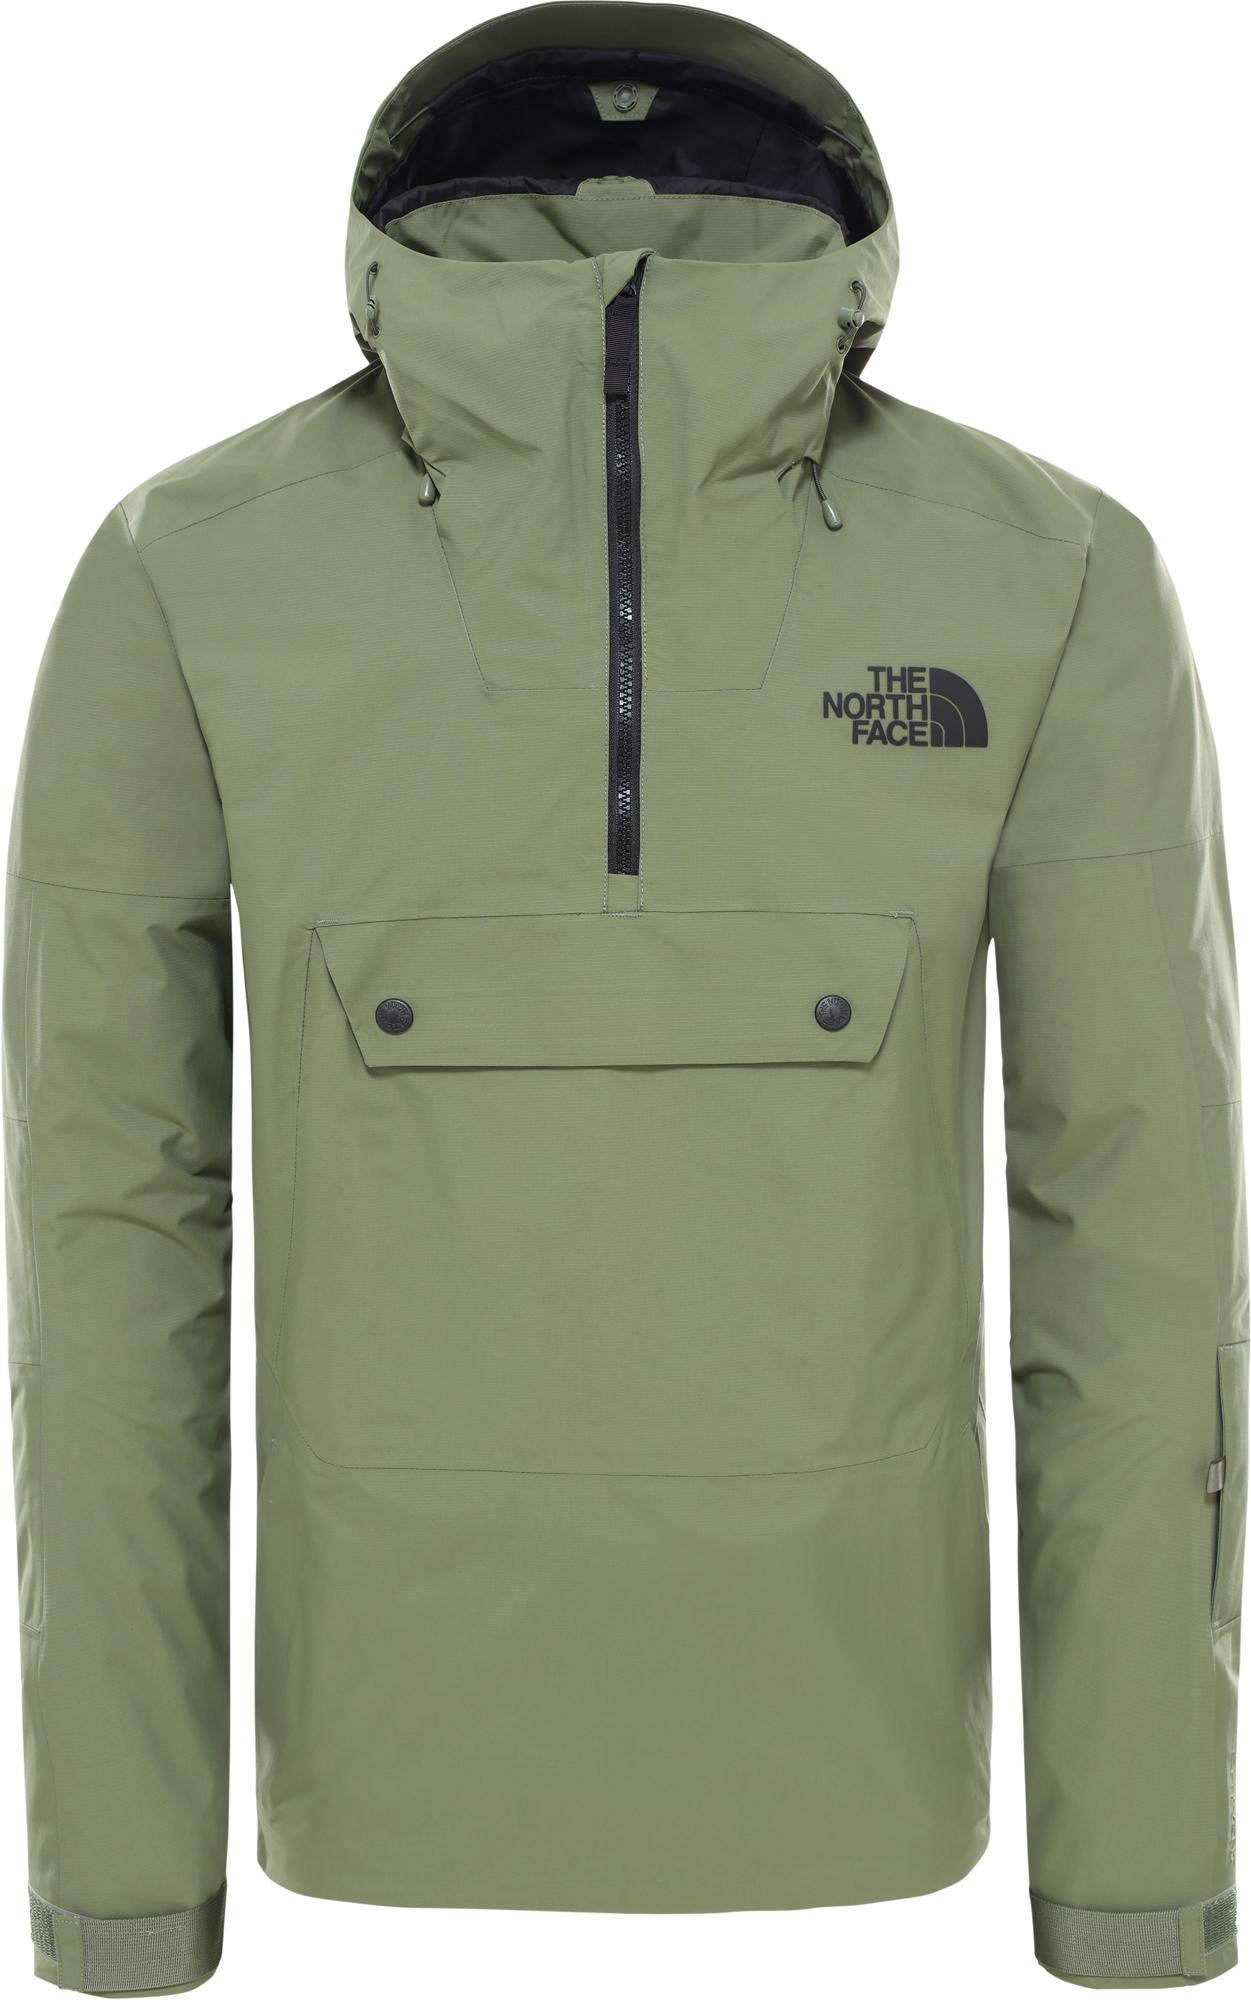 цена на The North Face Куртка мужская The North Face Silvani Anorak, размер 46